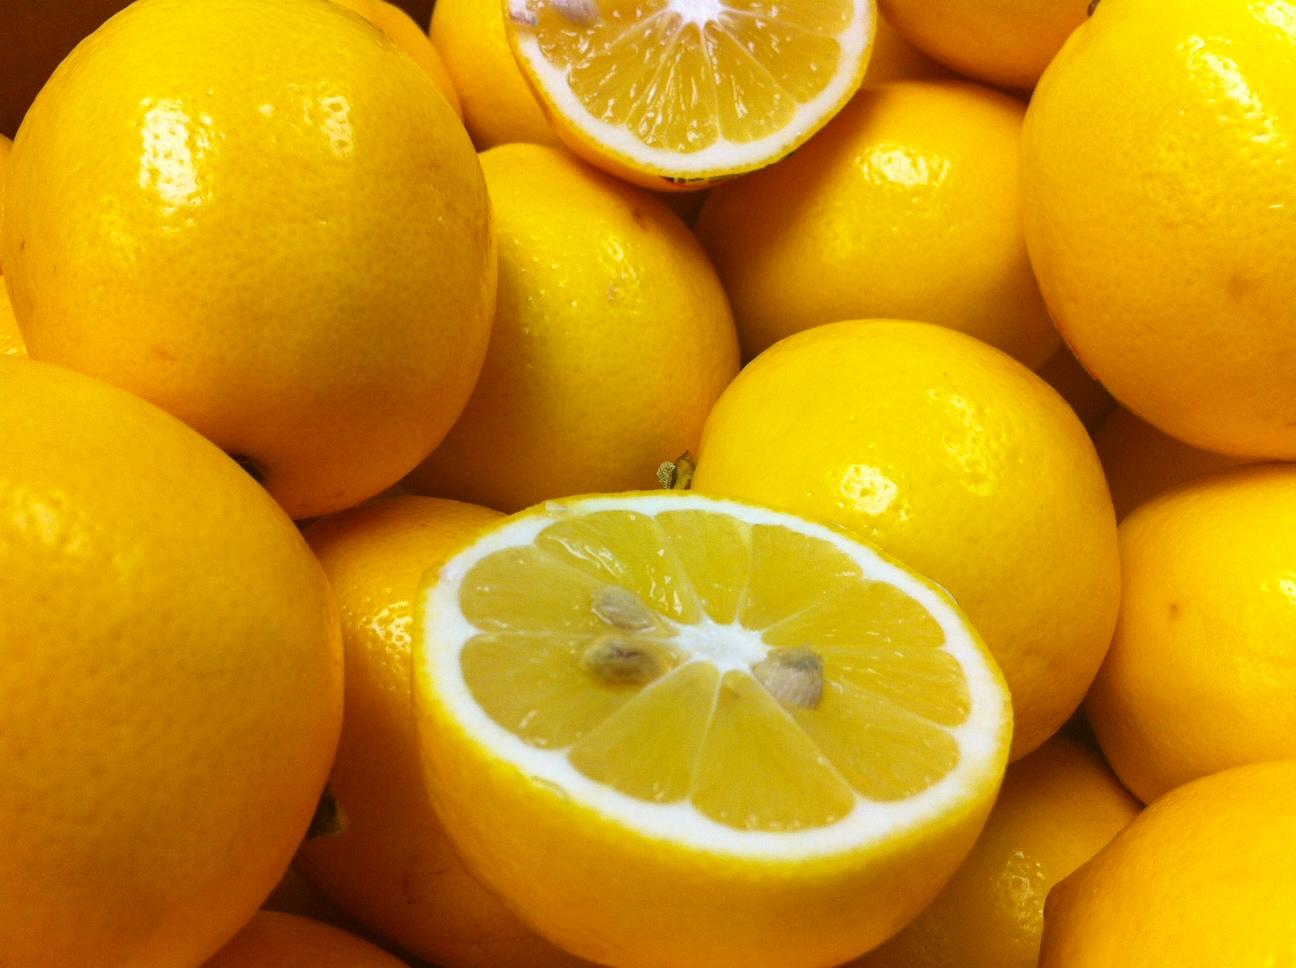 Madisono's Gelato: New Seasonal Flavors are Coming! Meyer Lemon sorbet